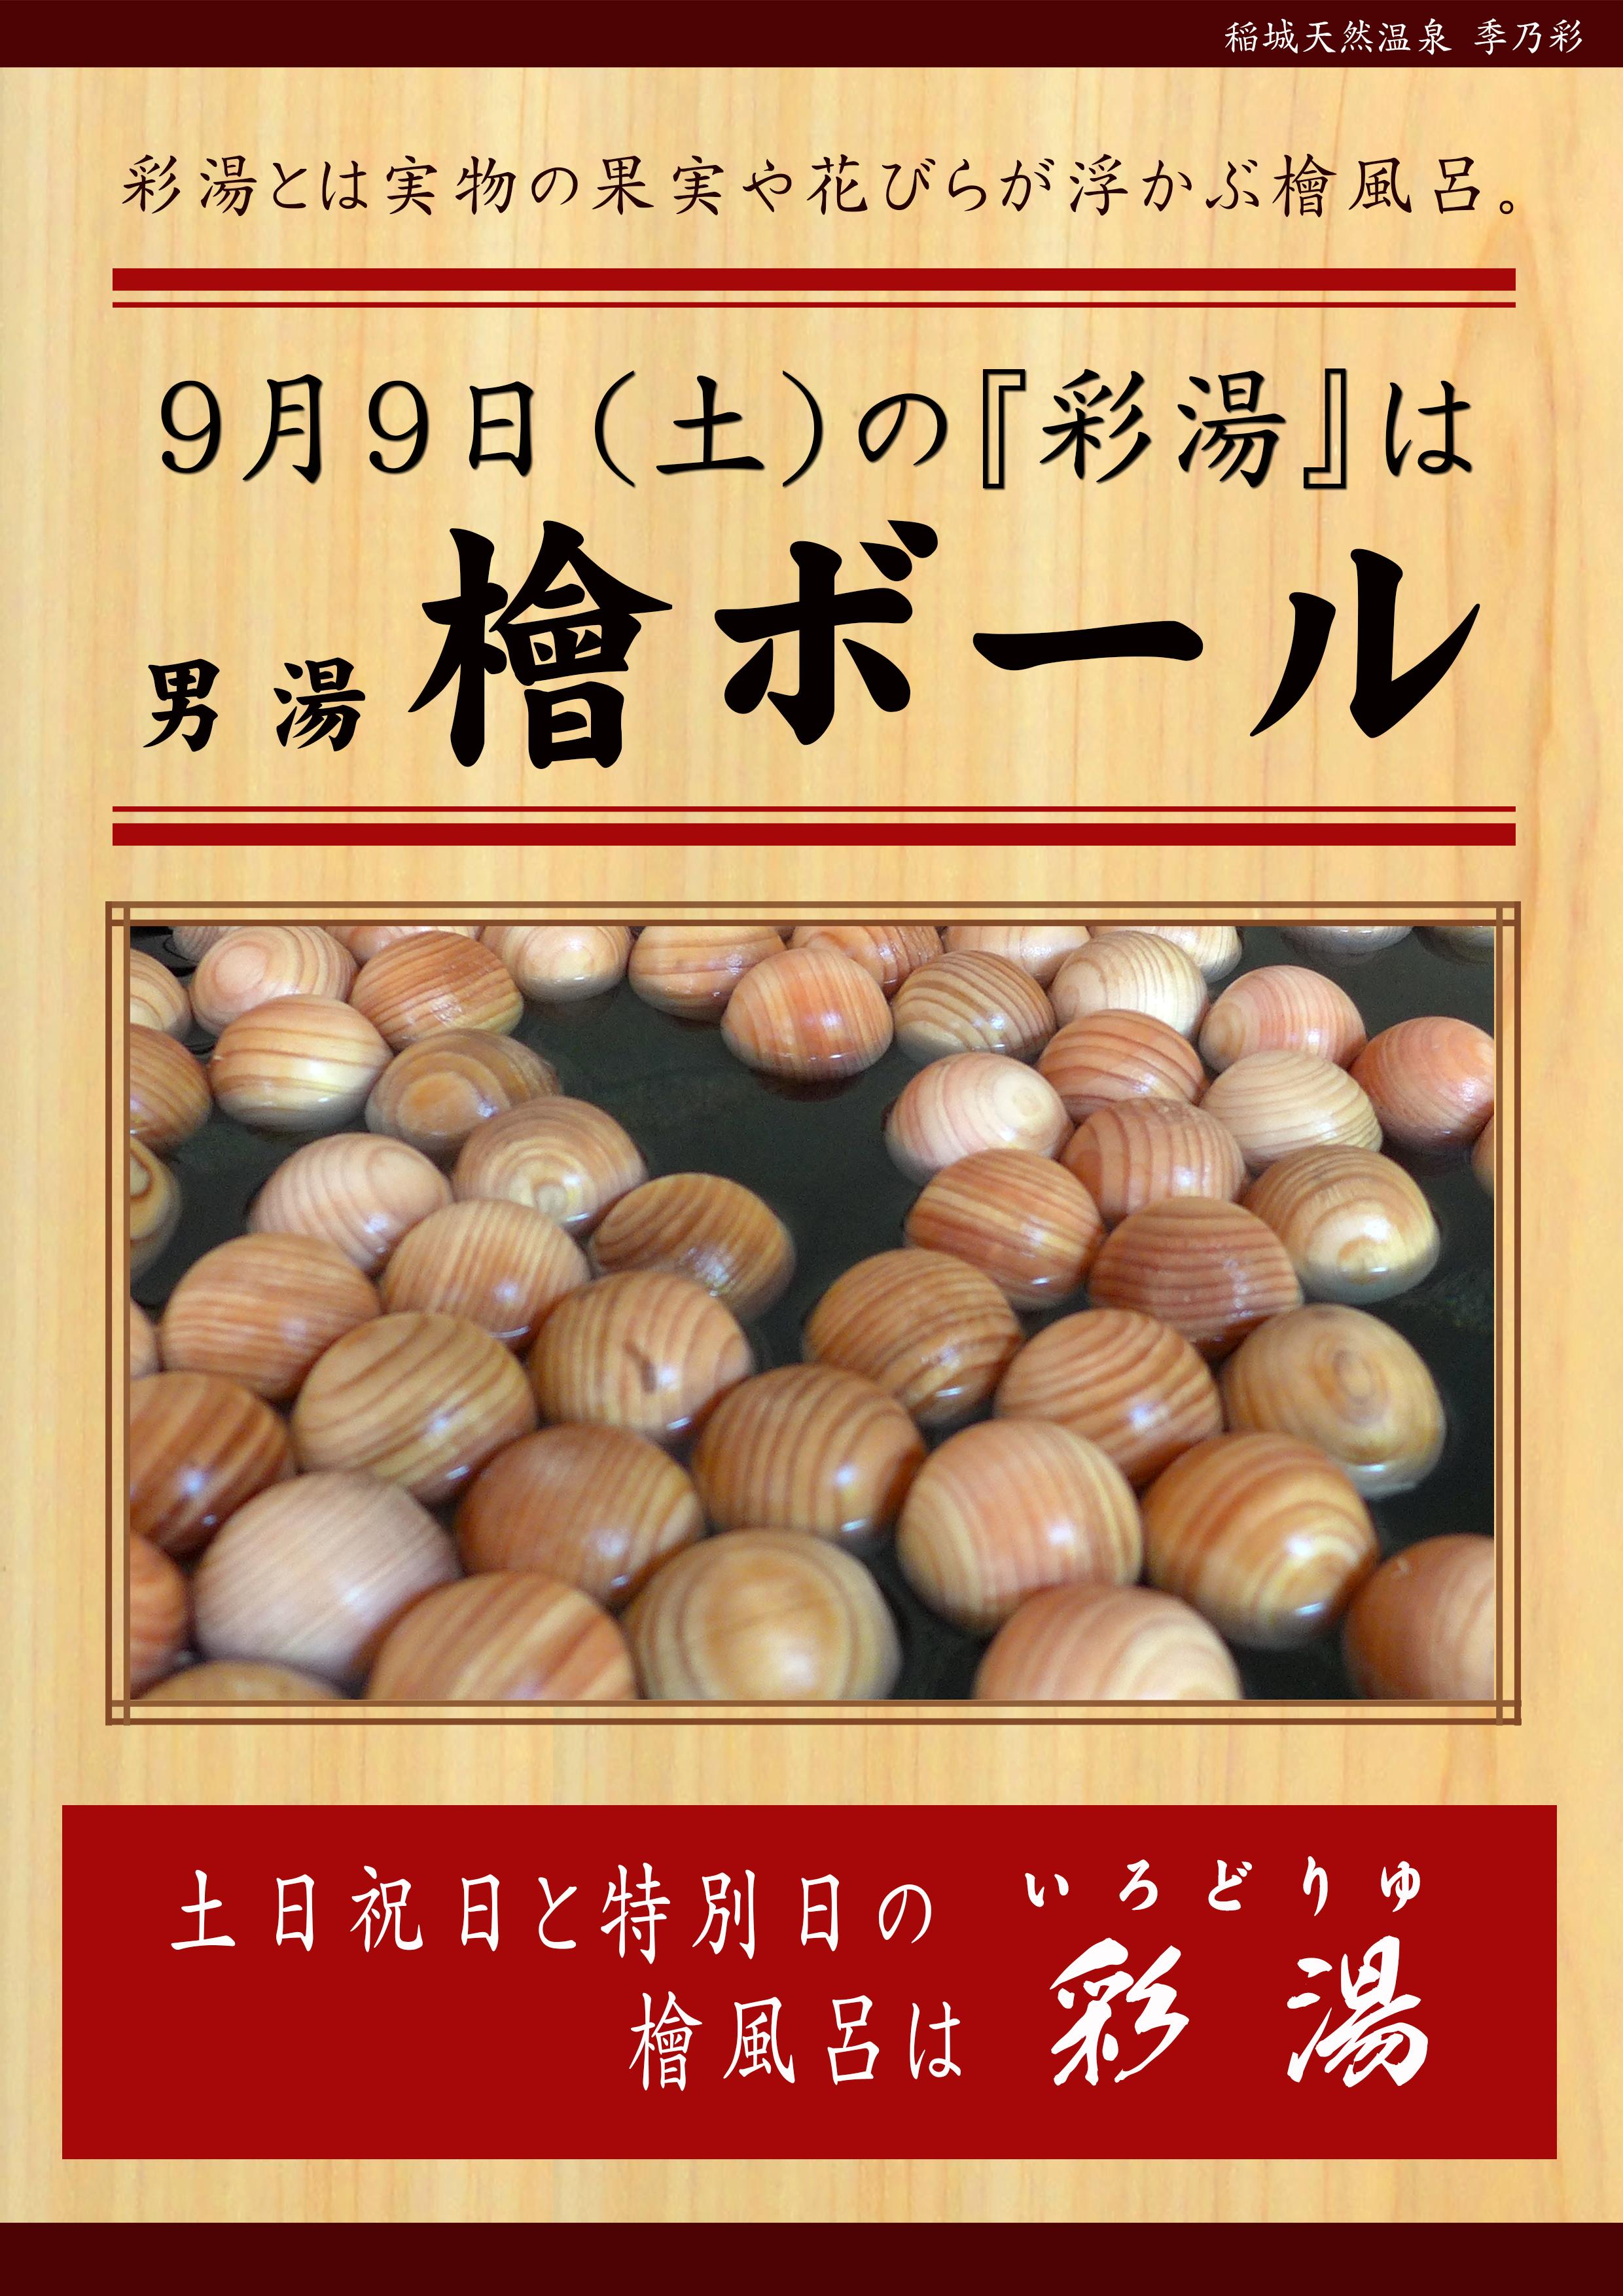 20170909POP イベント 彩湯 男湯 檜ボール